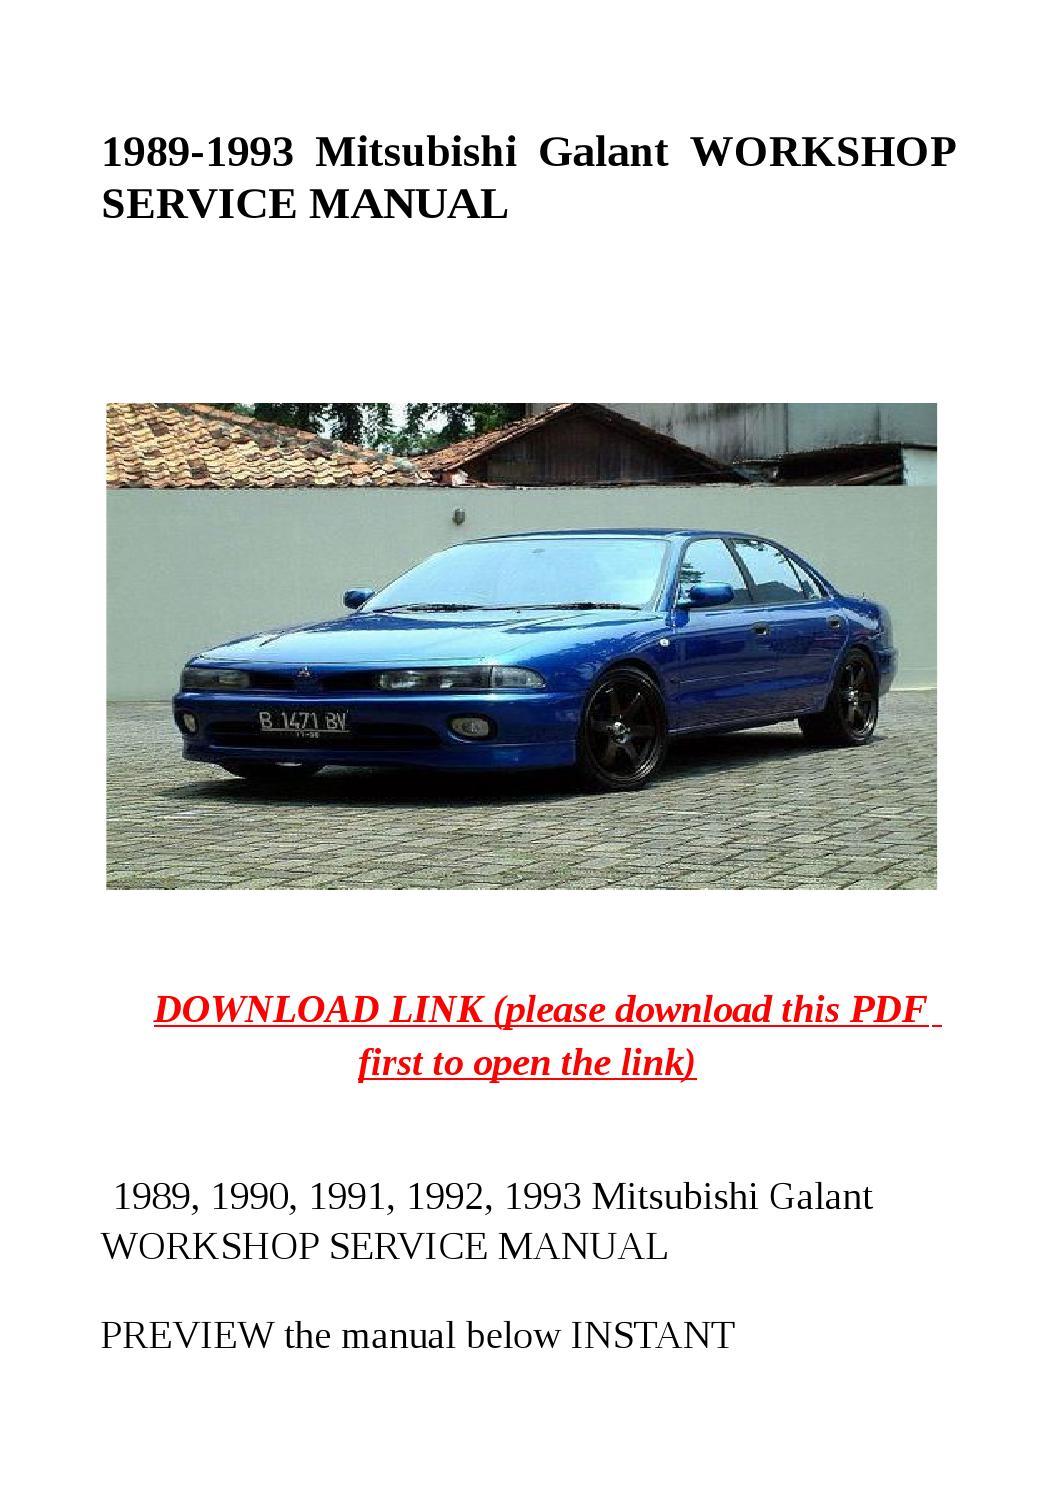 1989 1993 Mitsubishi Galant Workshop Service Manual By border=